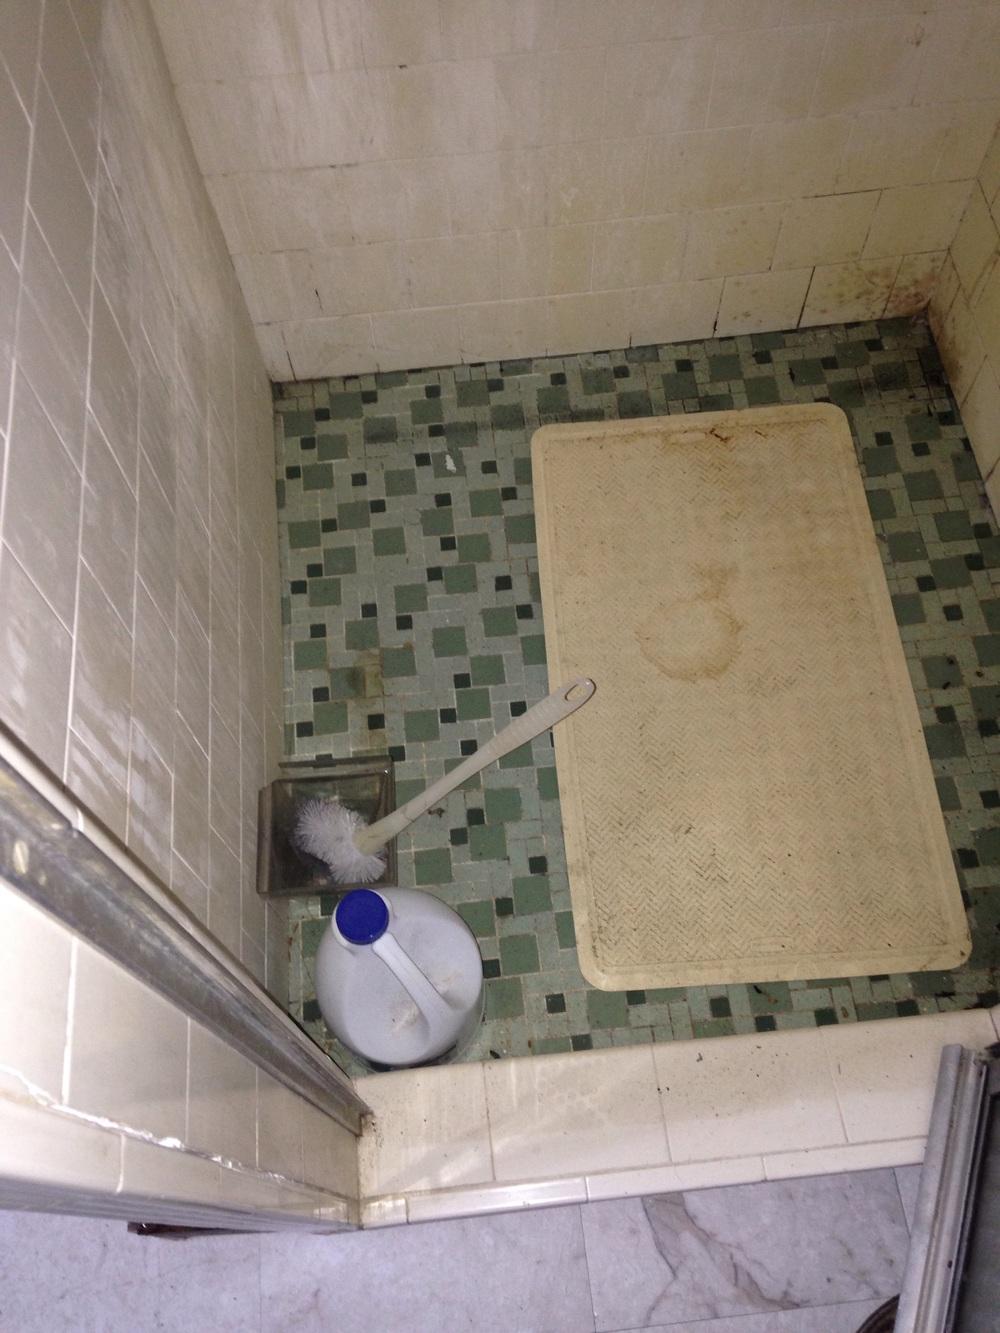 '60s mosaic shower pan floor